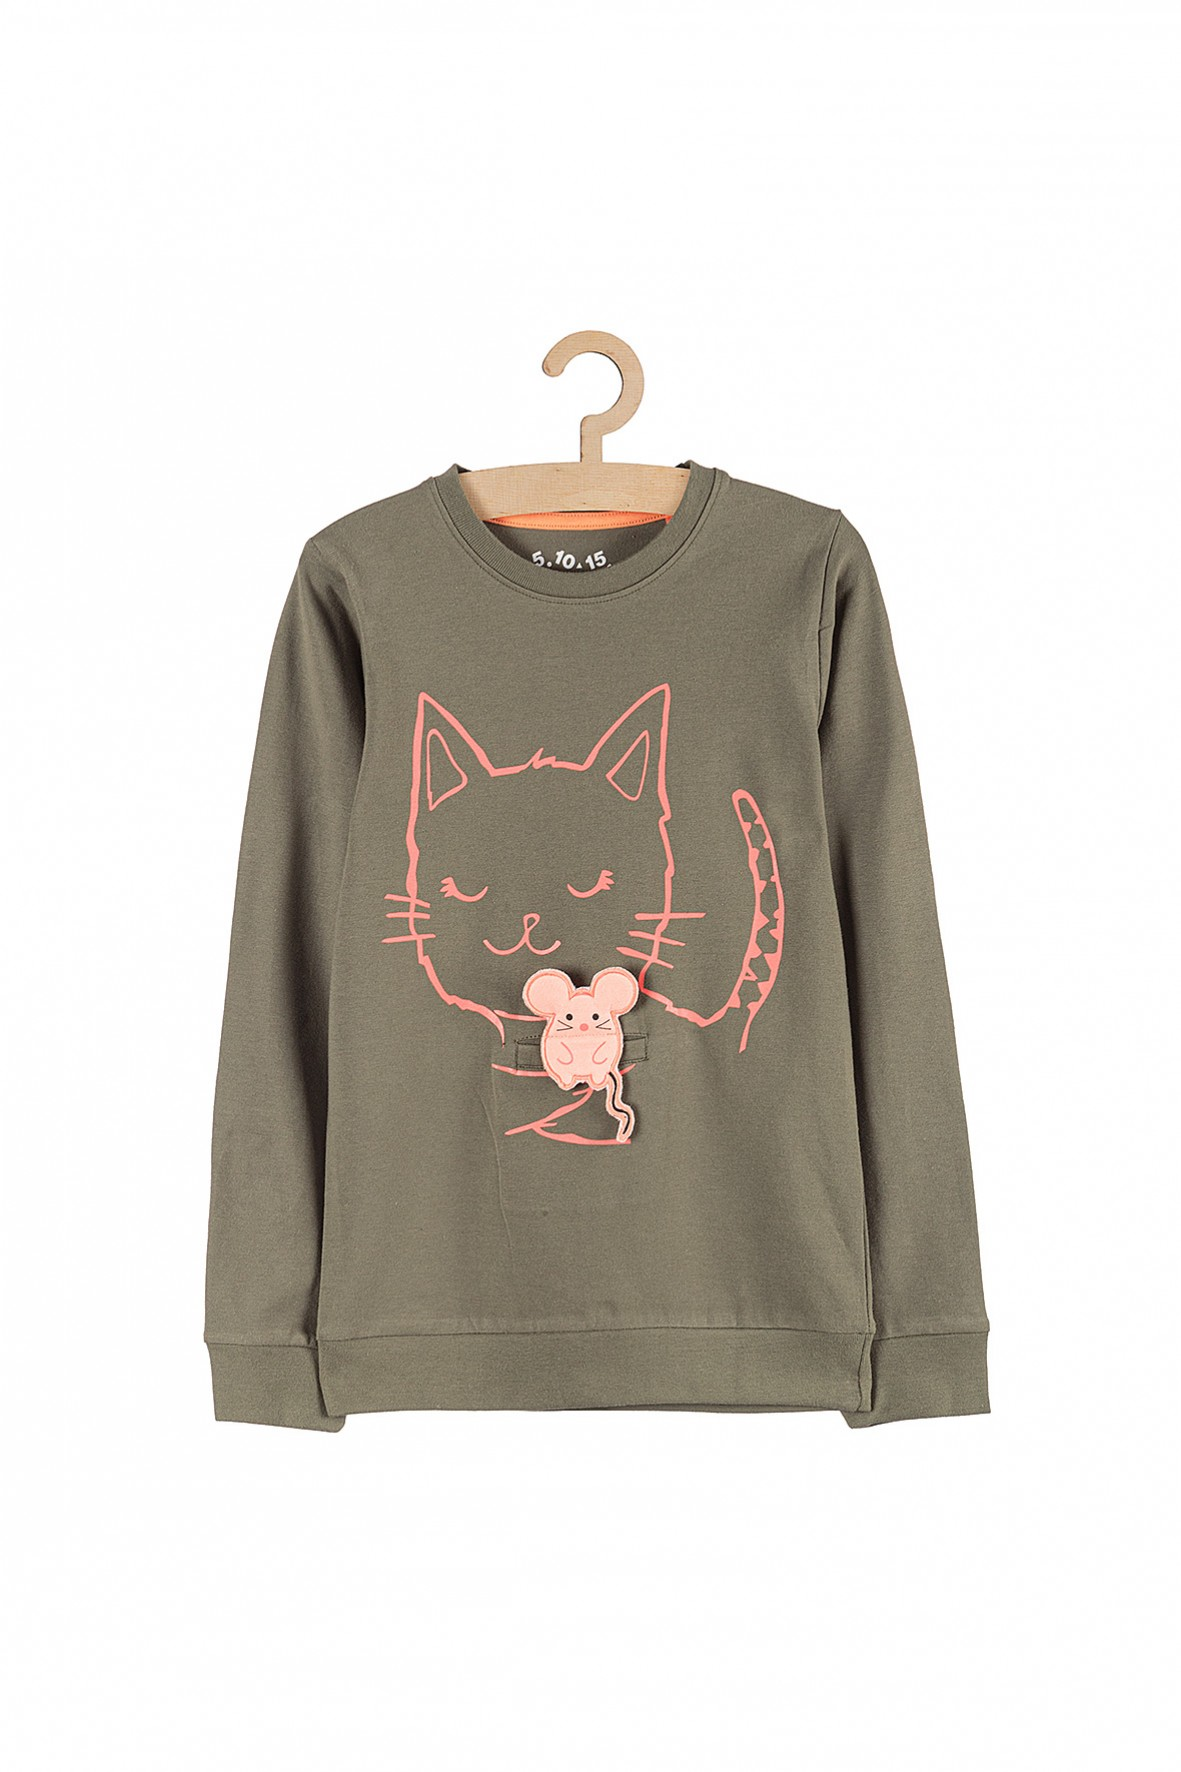 Bluza dziewczęca khaki- kot i myszka